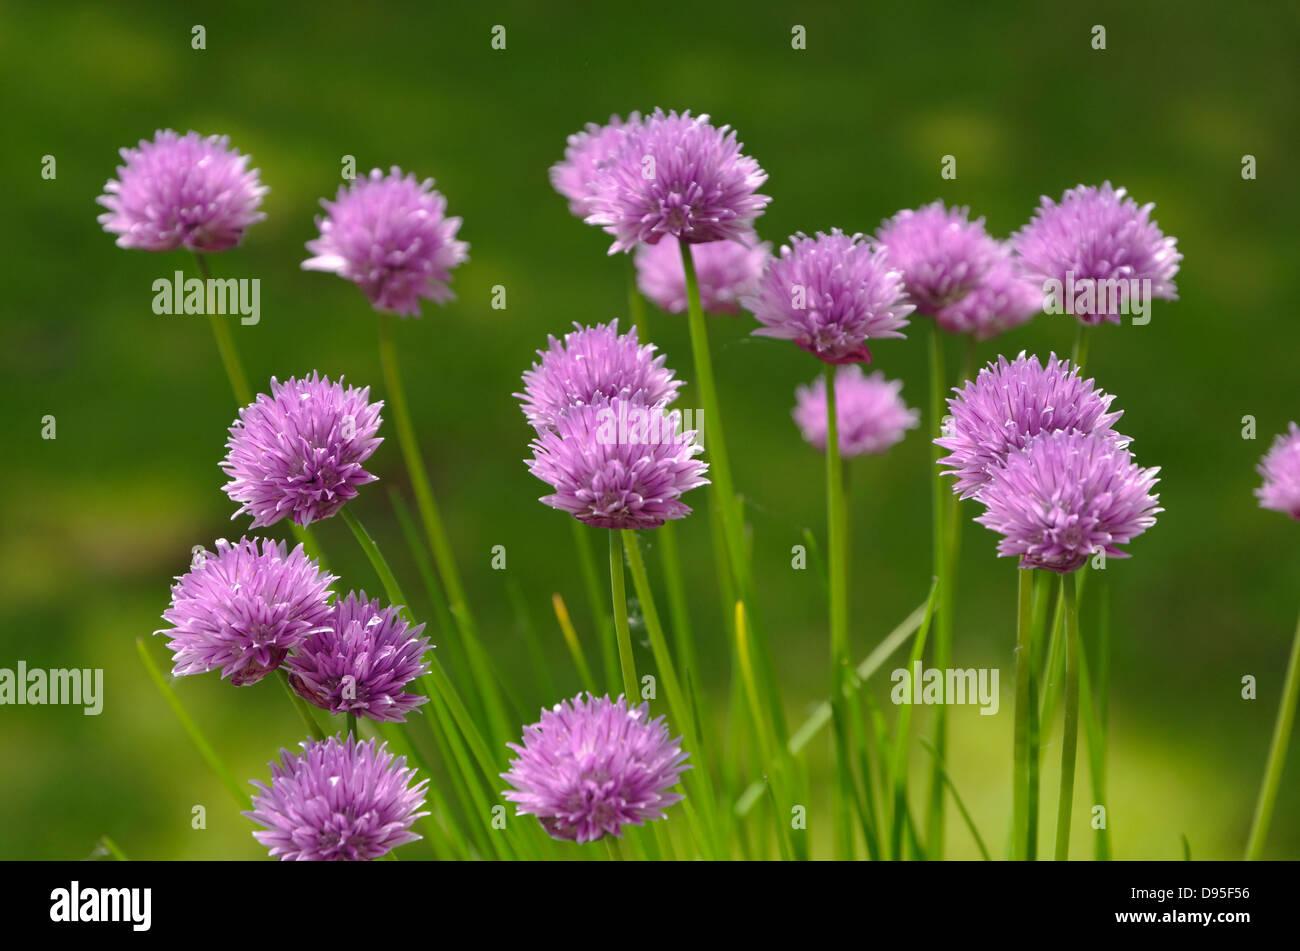 Flowers of Chives. Allium schoenoprasum - Stock Image